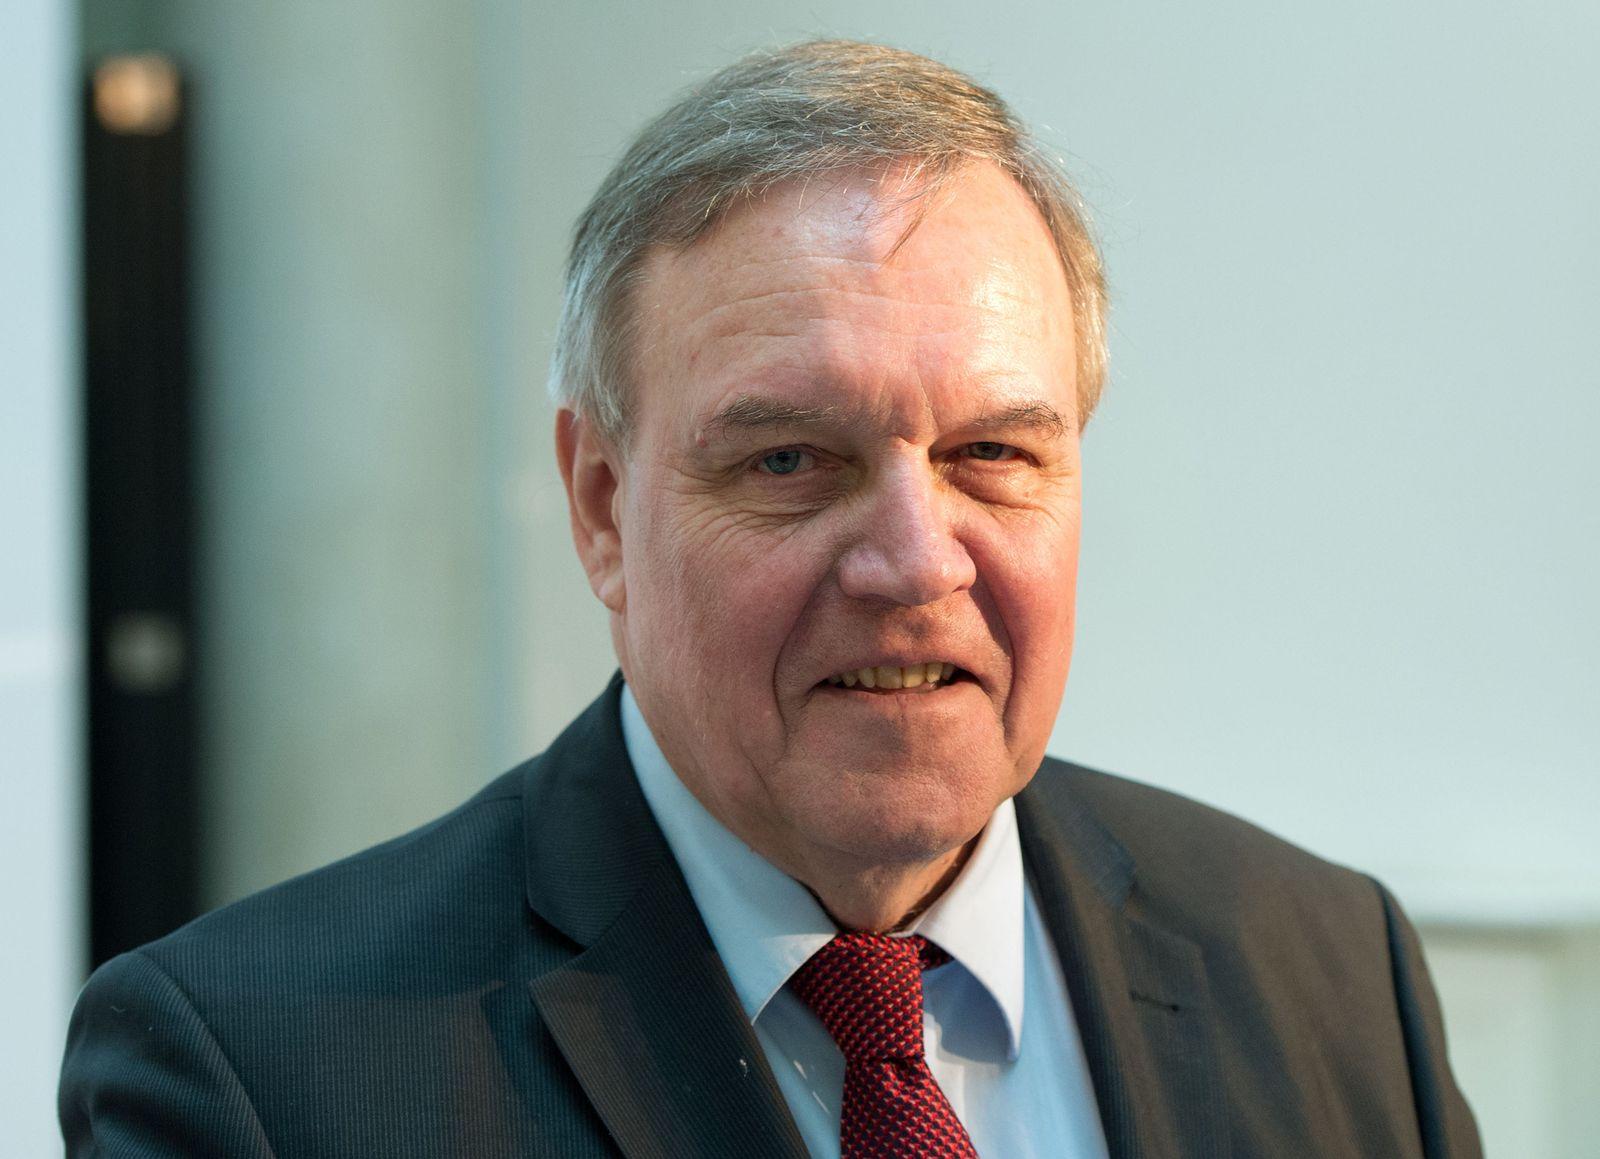 Volker Rühe